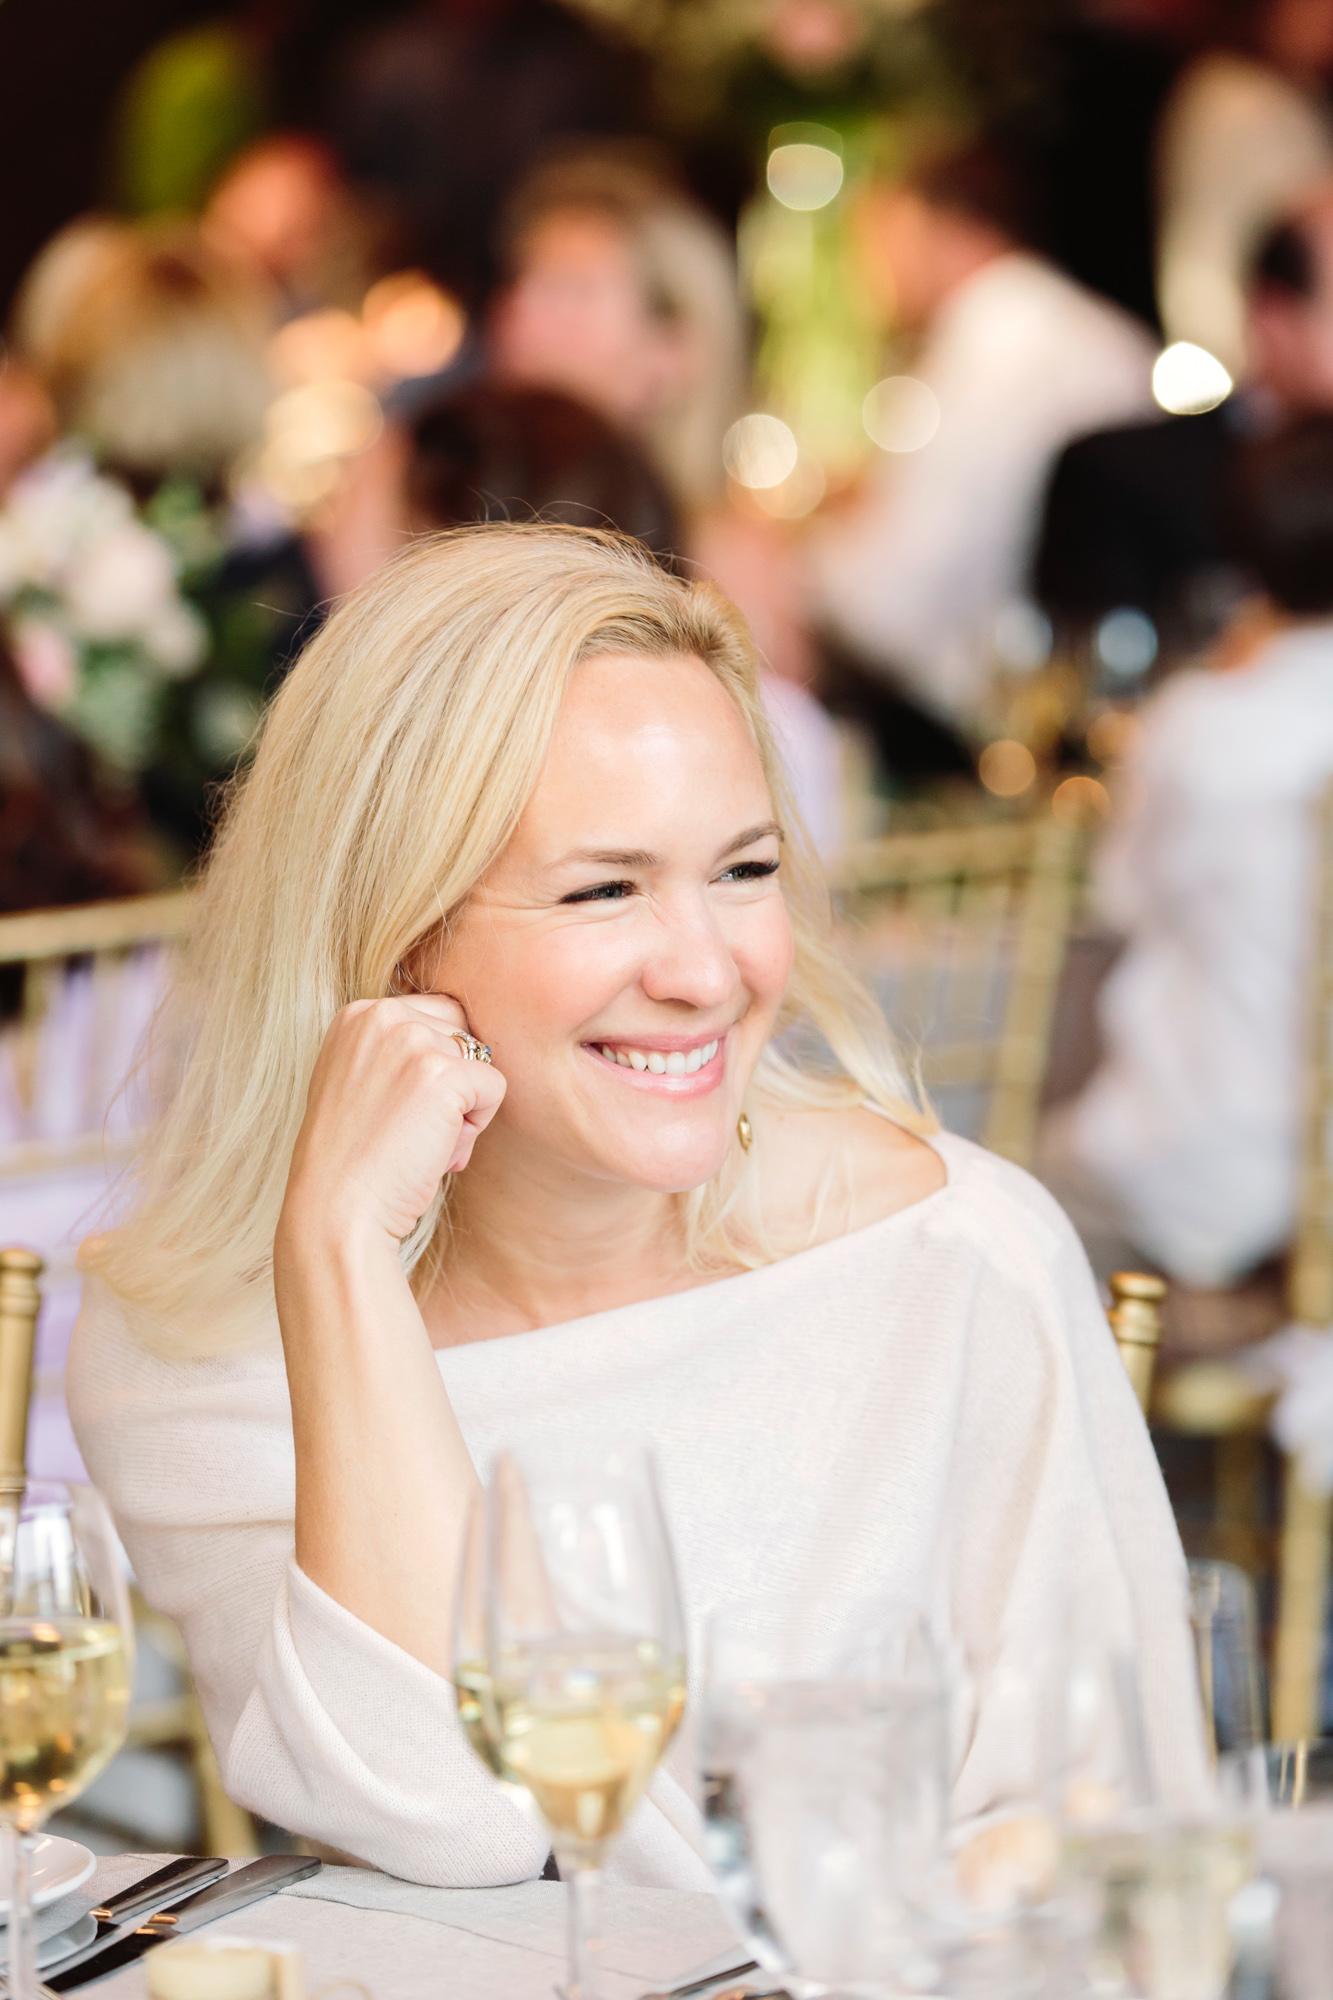 71_Rowan_Brian_The_Roundhouse_Wedding_Beacon_NY_Tanya_Salazar_Photography_759.jpg